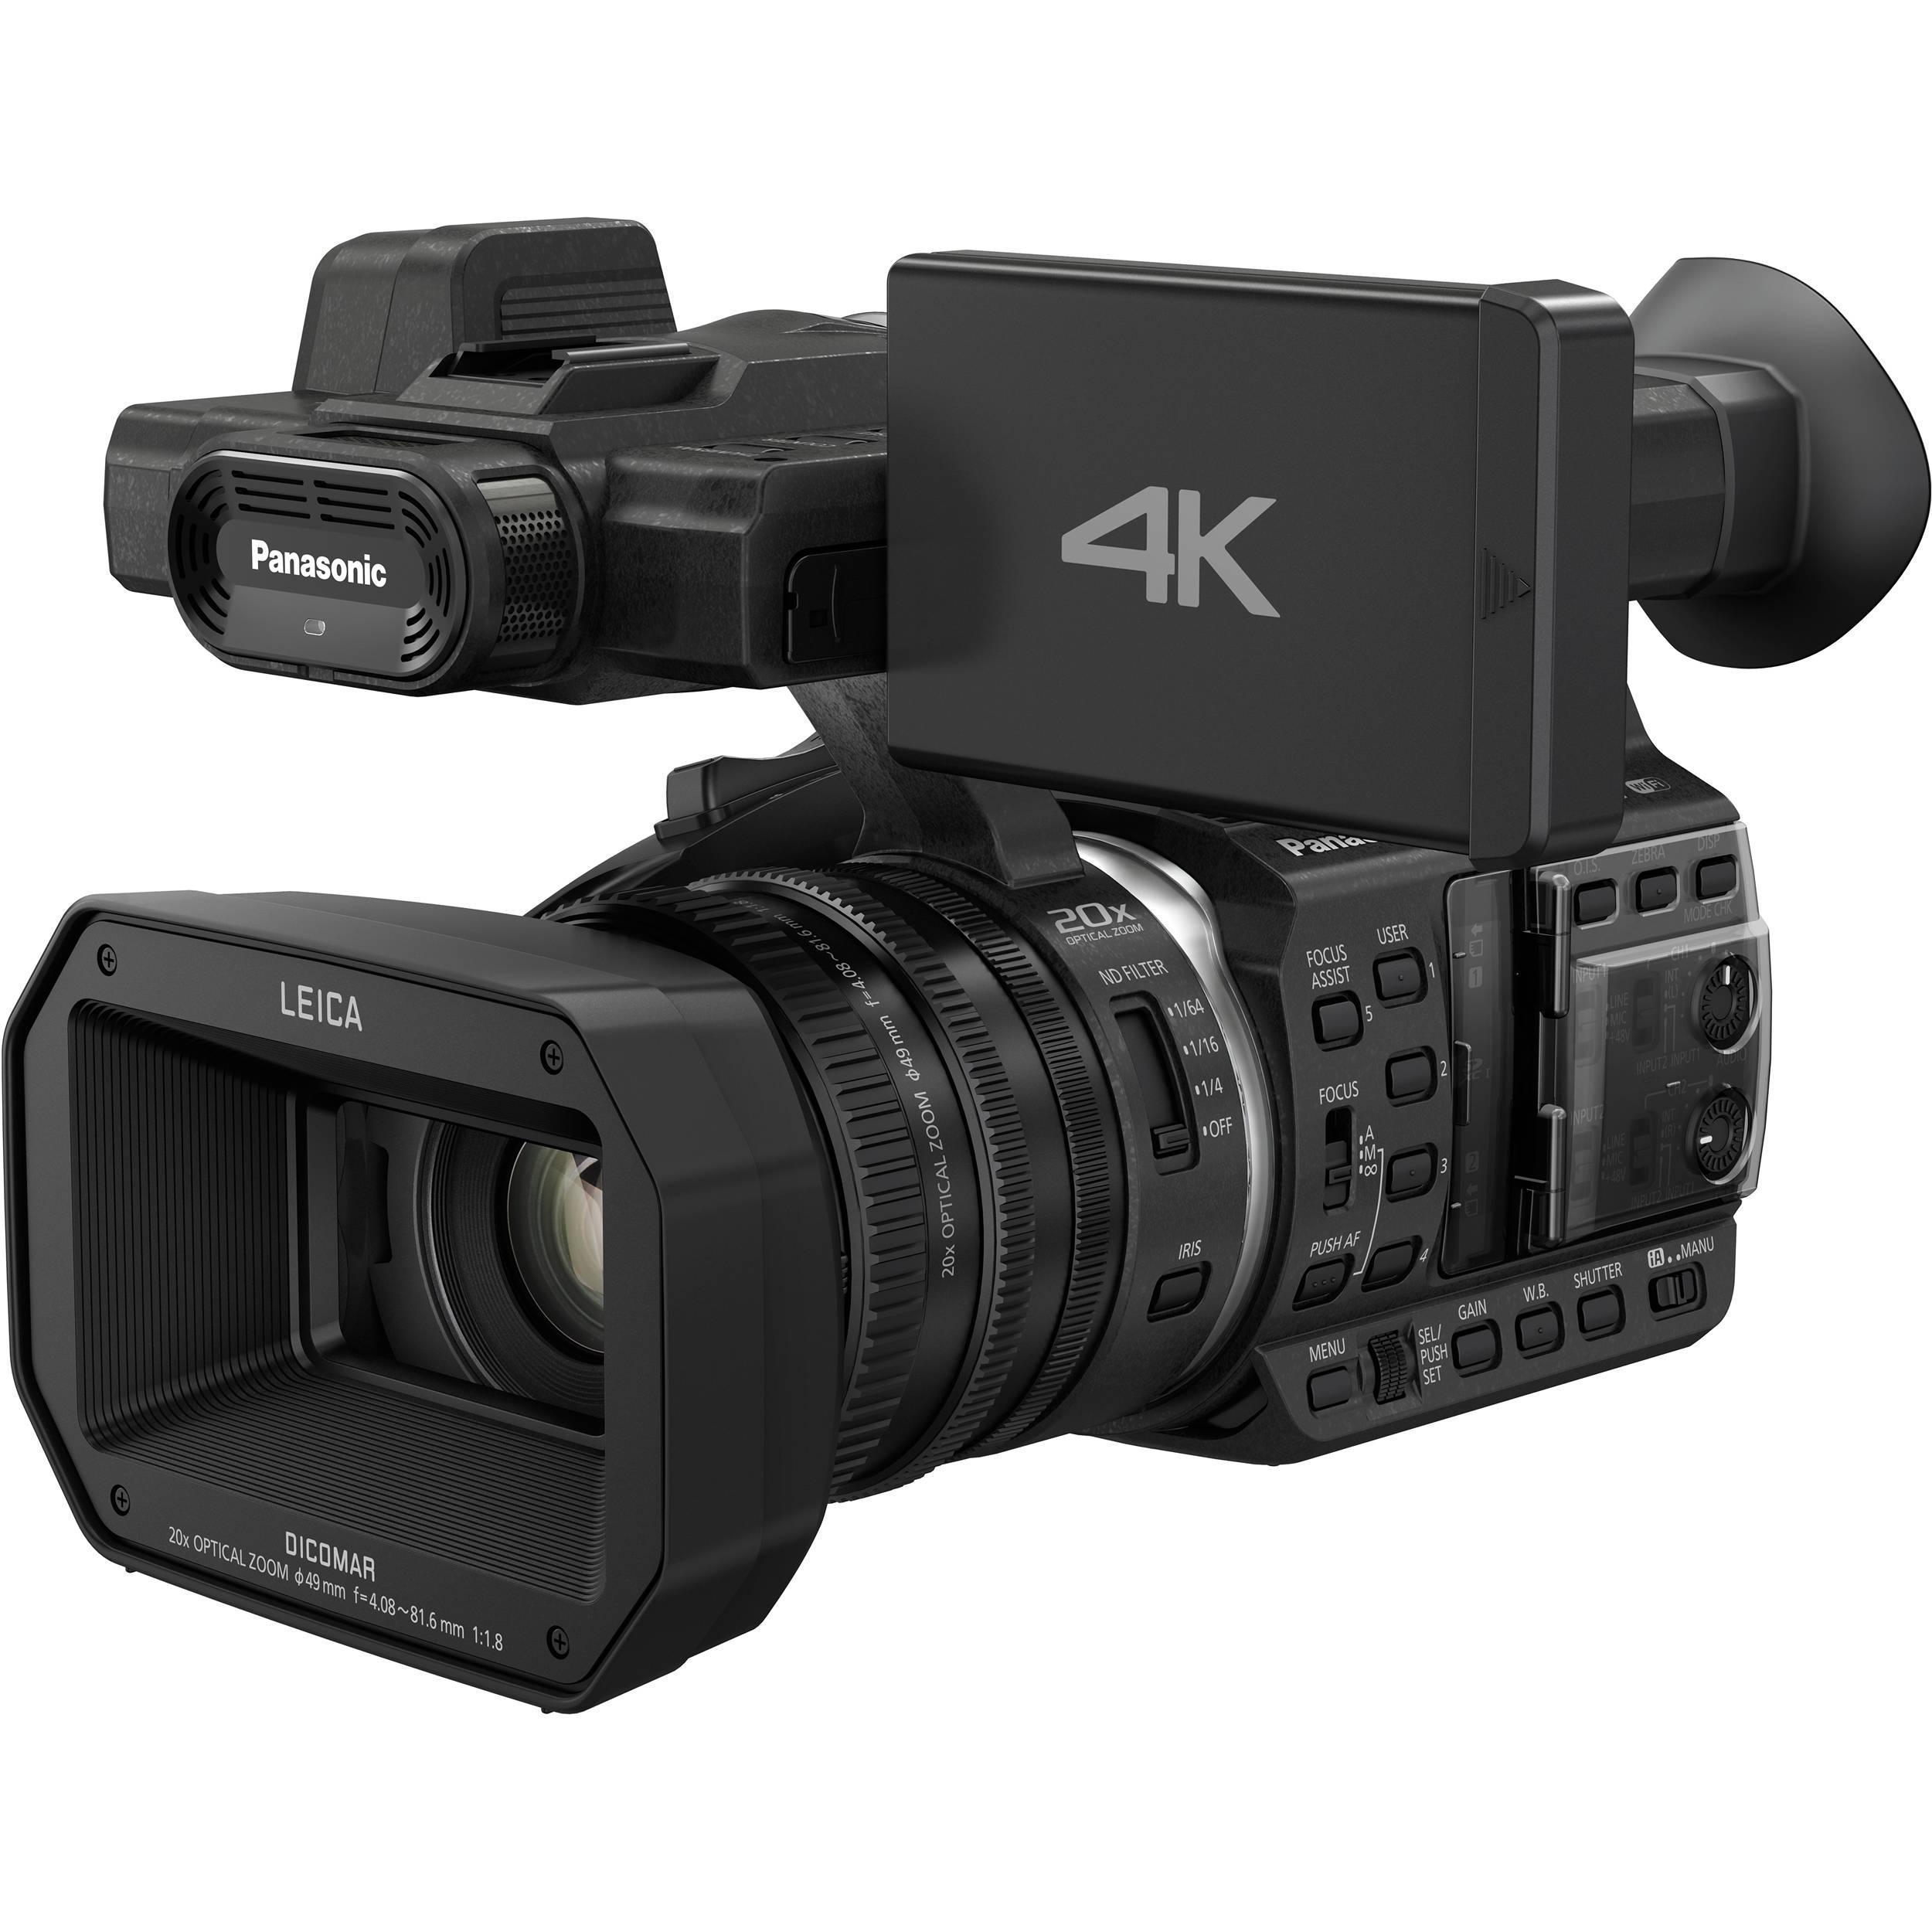 Caméscope Panasonic HC-X1000 4K - Noir